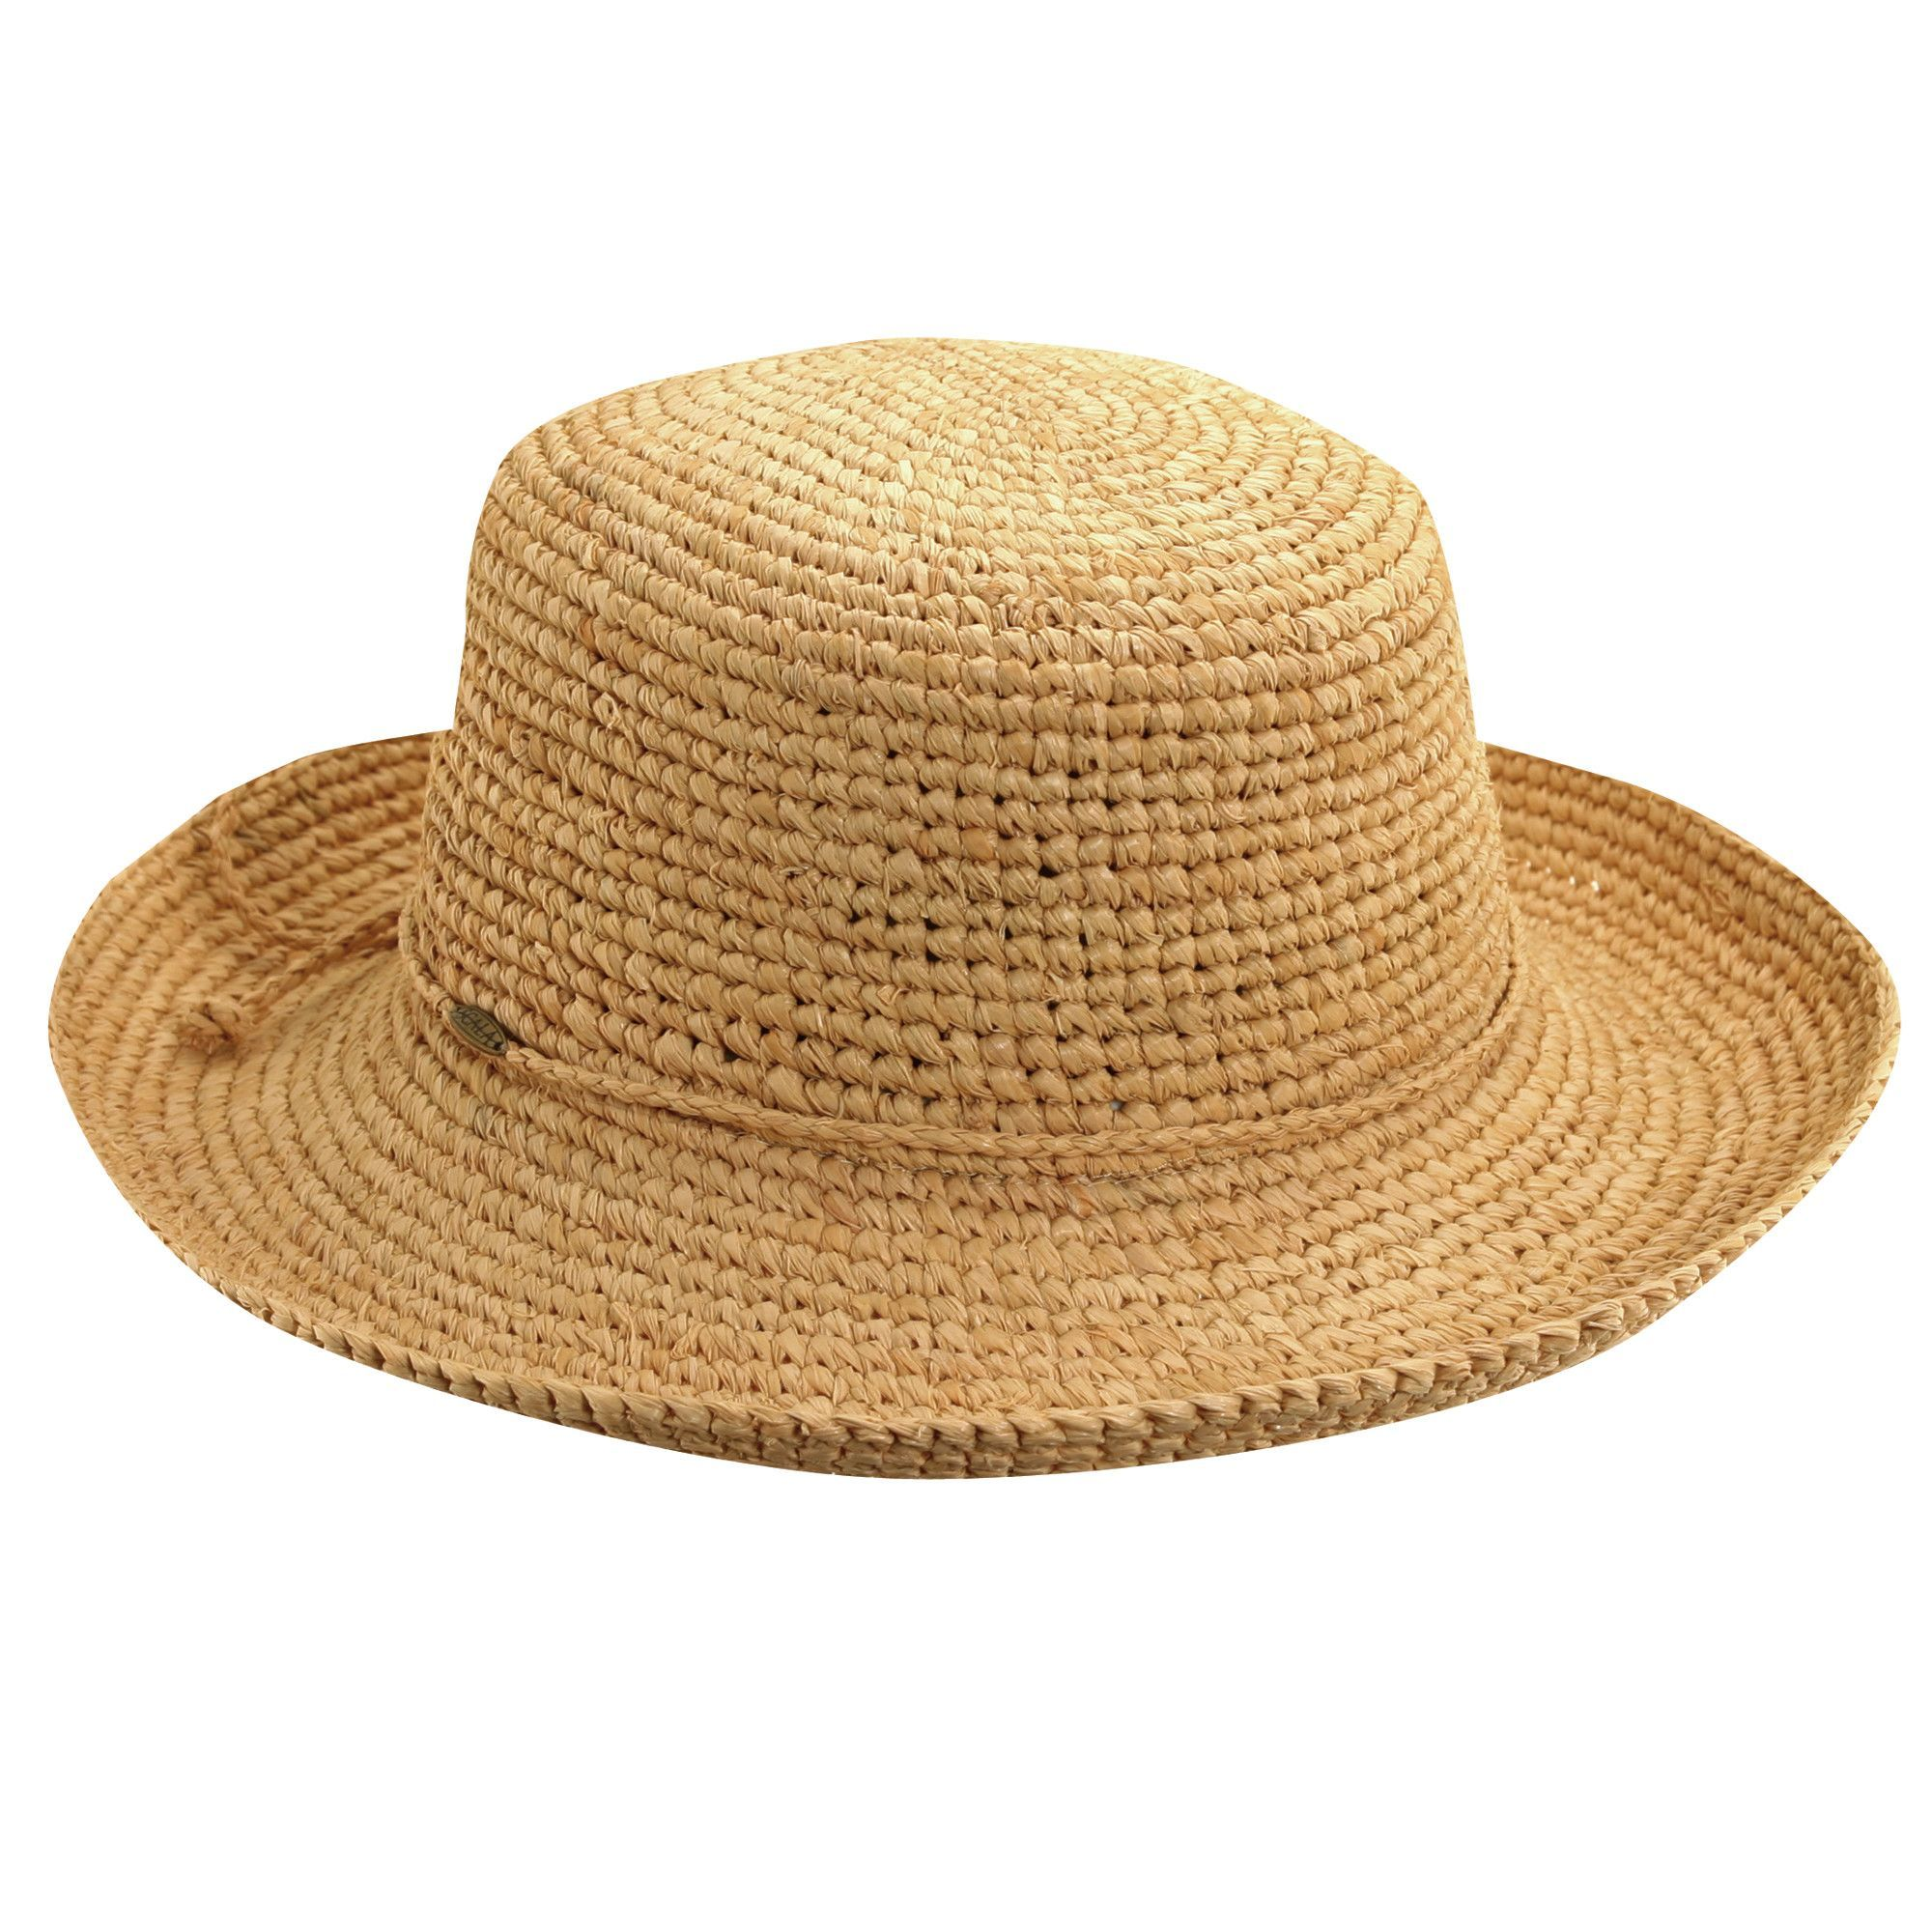 5ef718f39ae037 Scala Crocheted Raffia Kettle Brim - Petite | Ladies Summer Hats ...